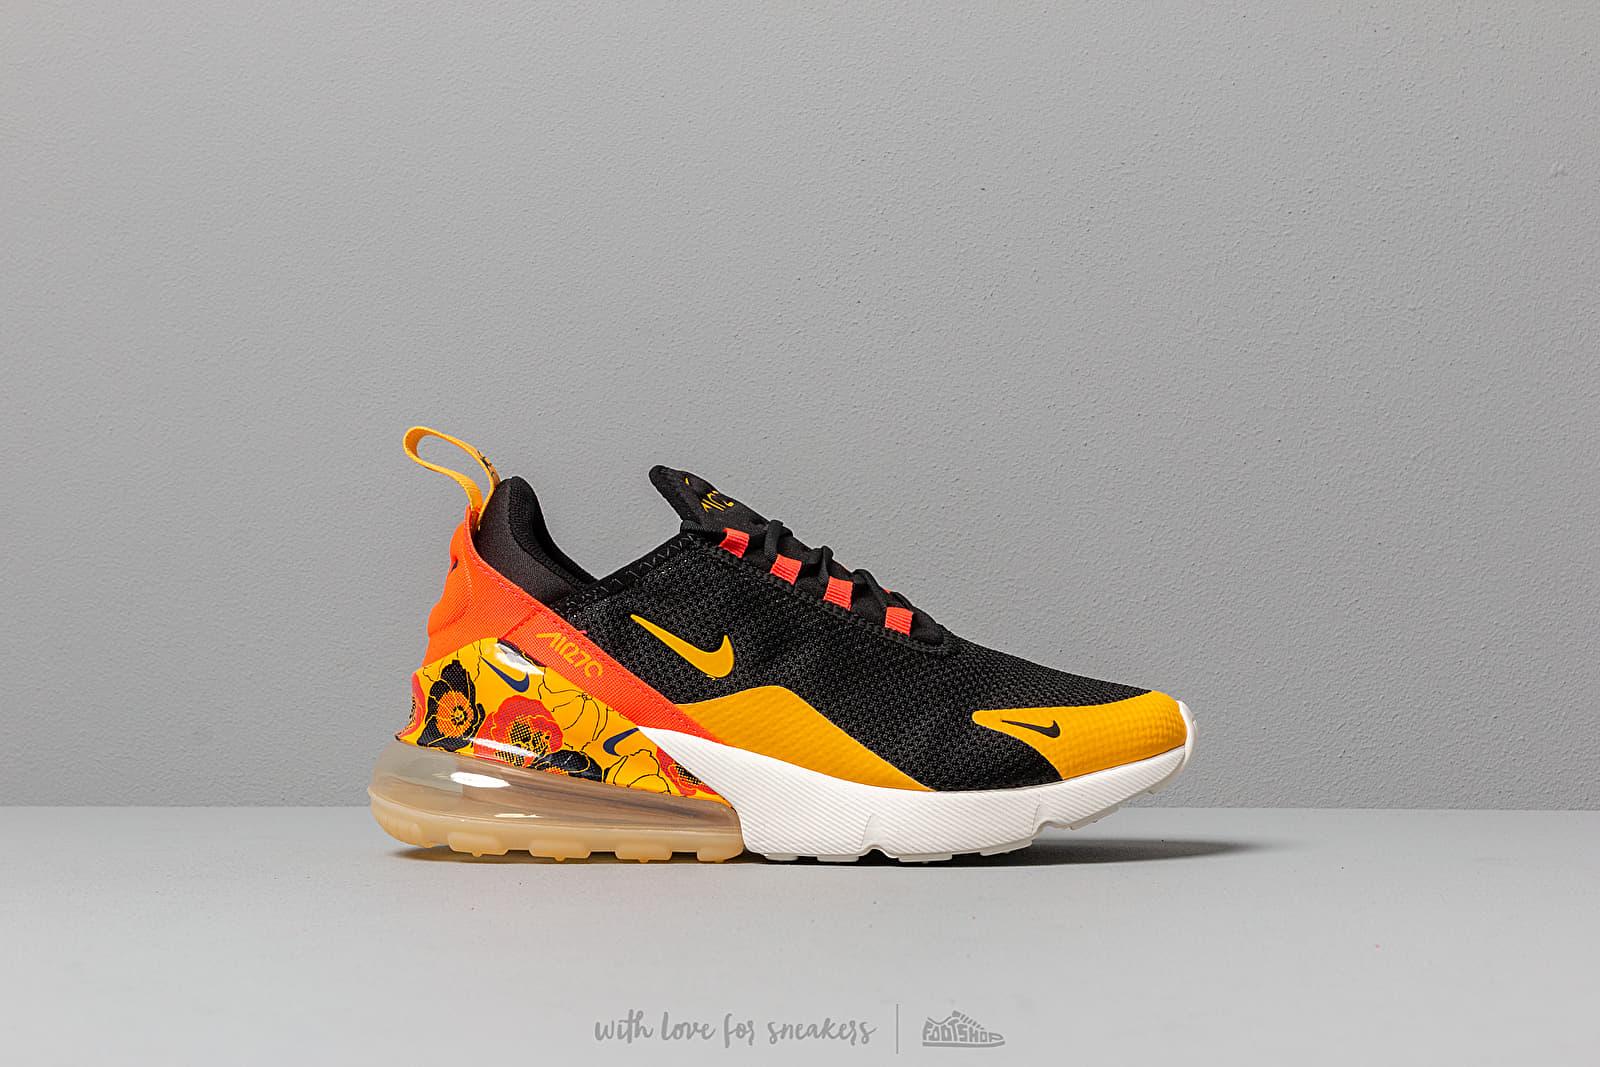 low priced 70385 cebab Nike W Air Max 270 Se Black/ University Gold-Bright Crimson at a great